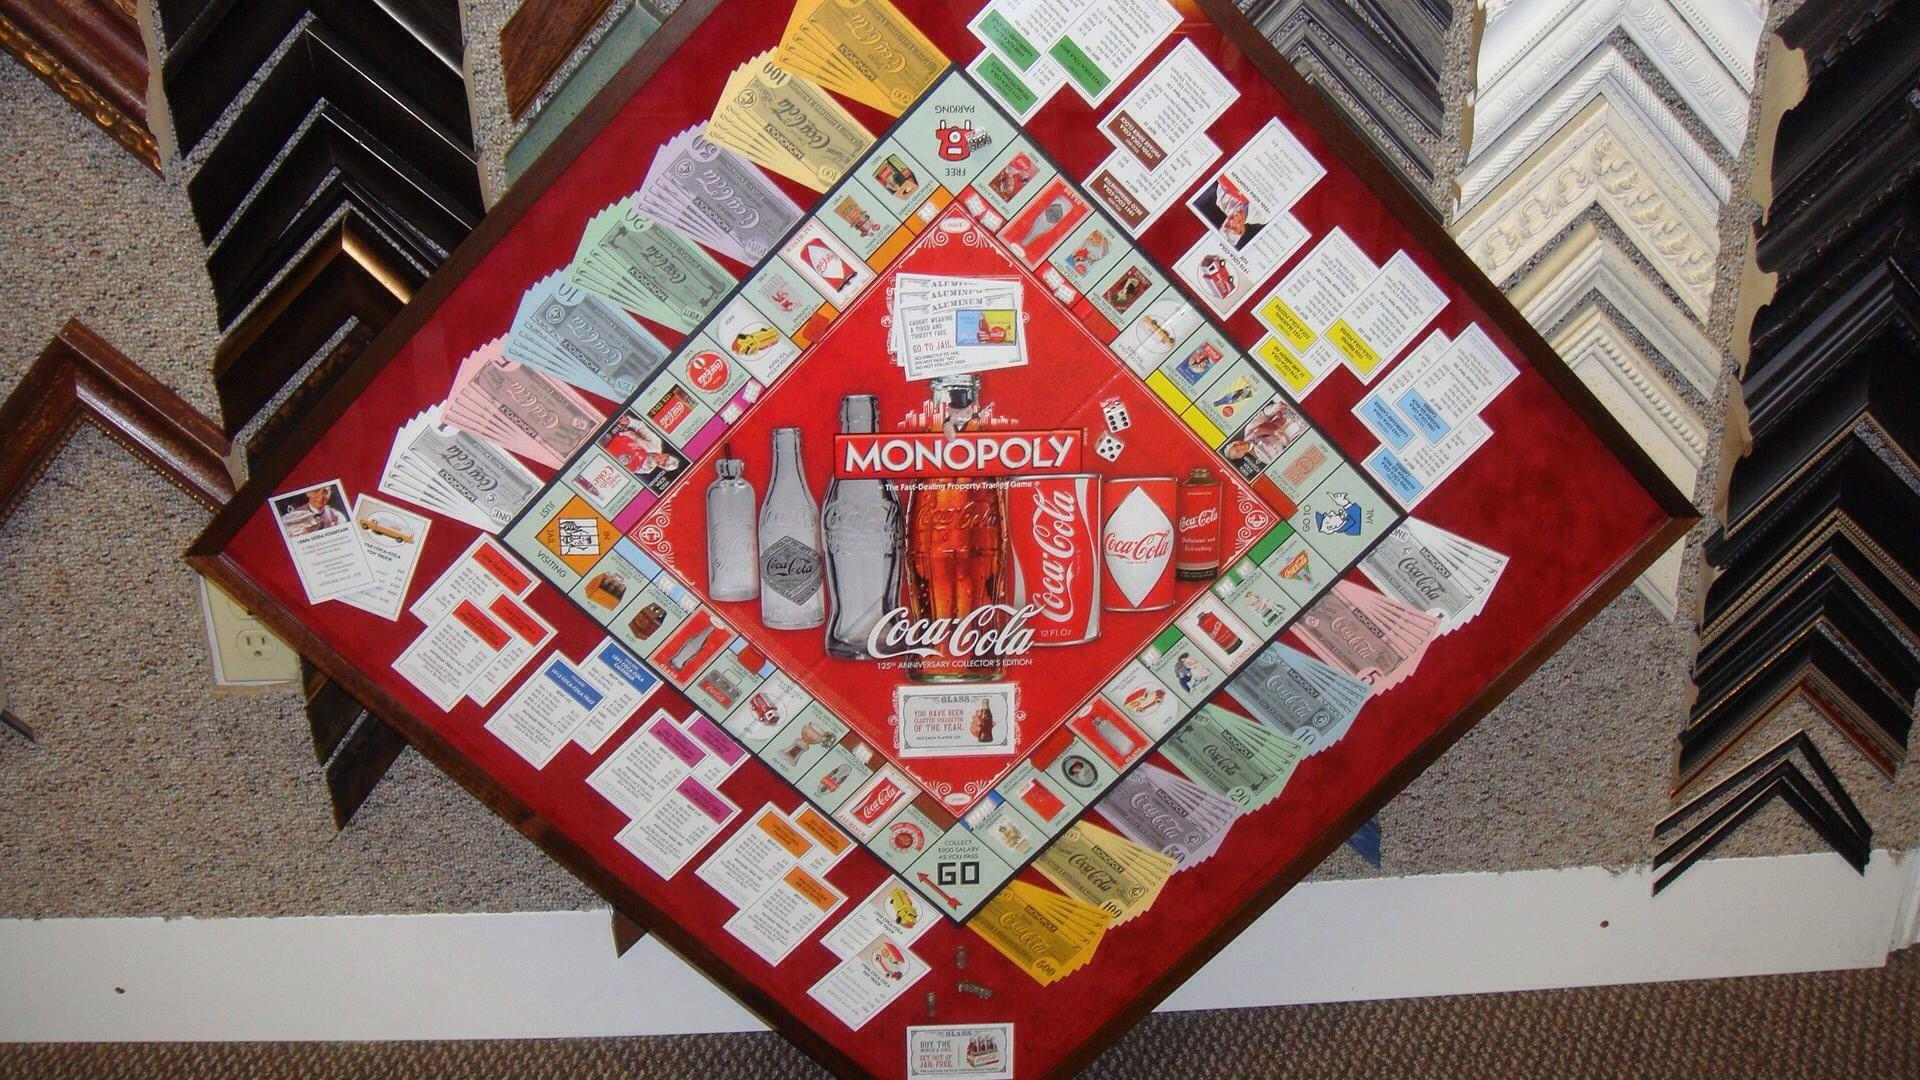 Coca cola monopoly board custom framed at Amy\'s Village Frame Shop ...